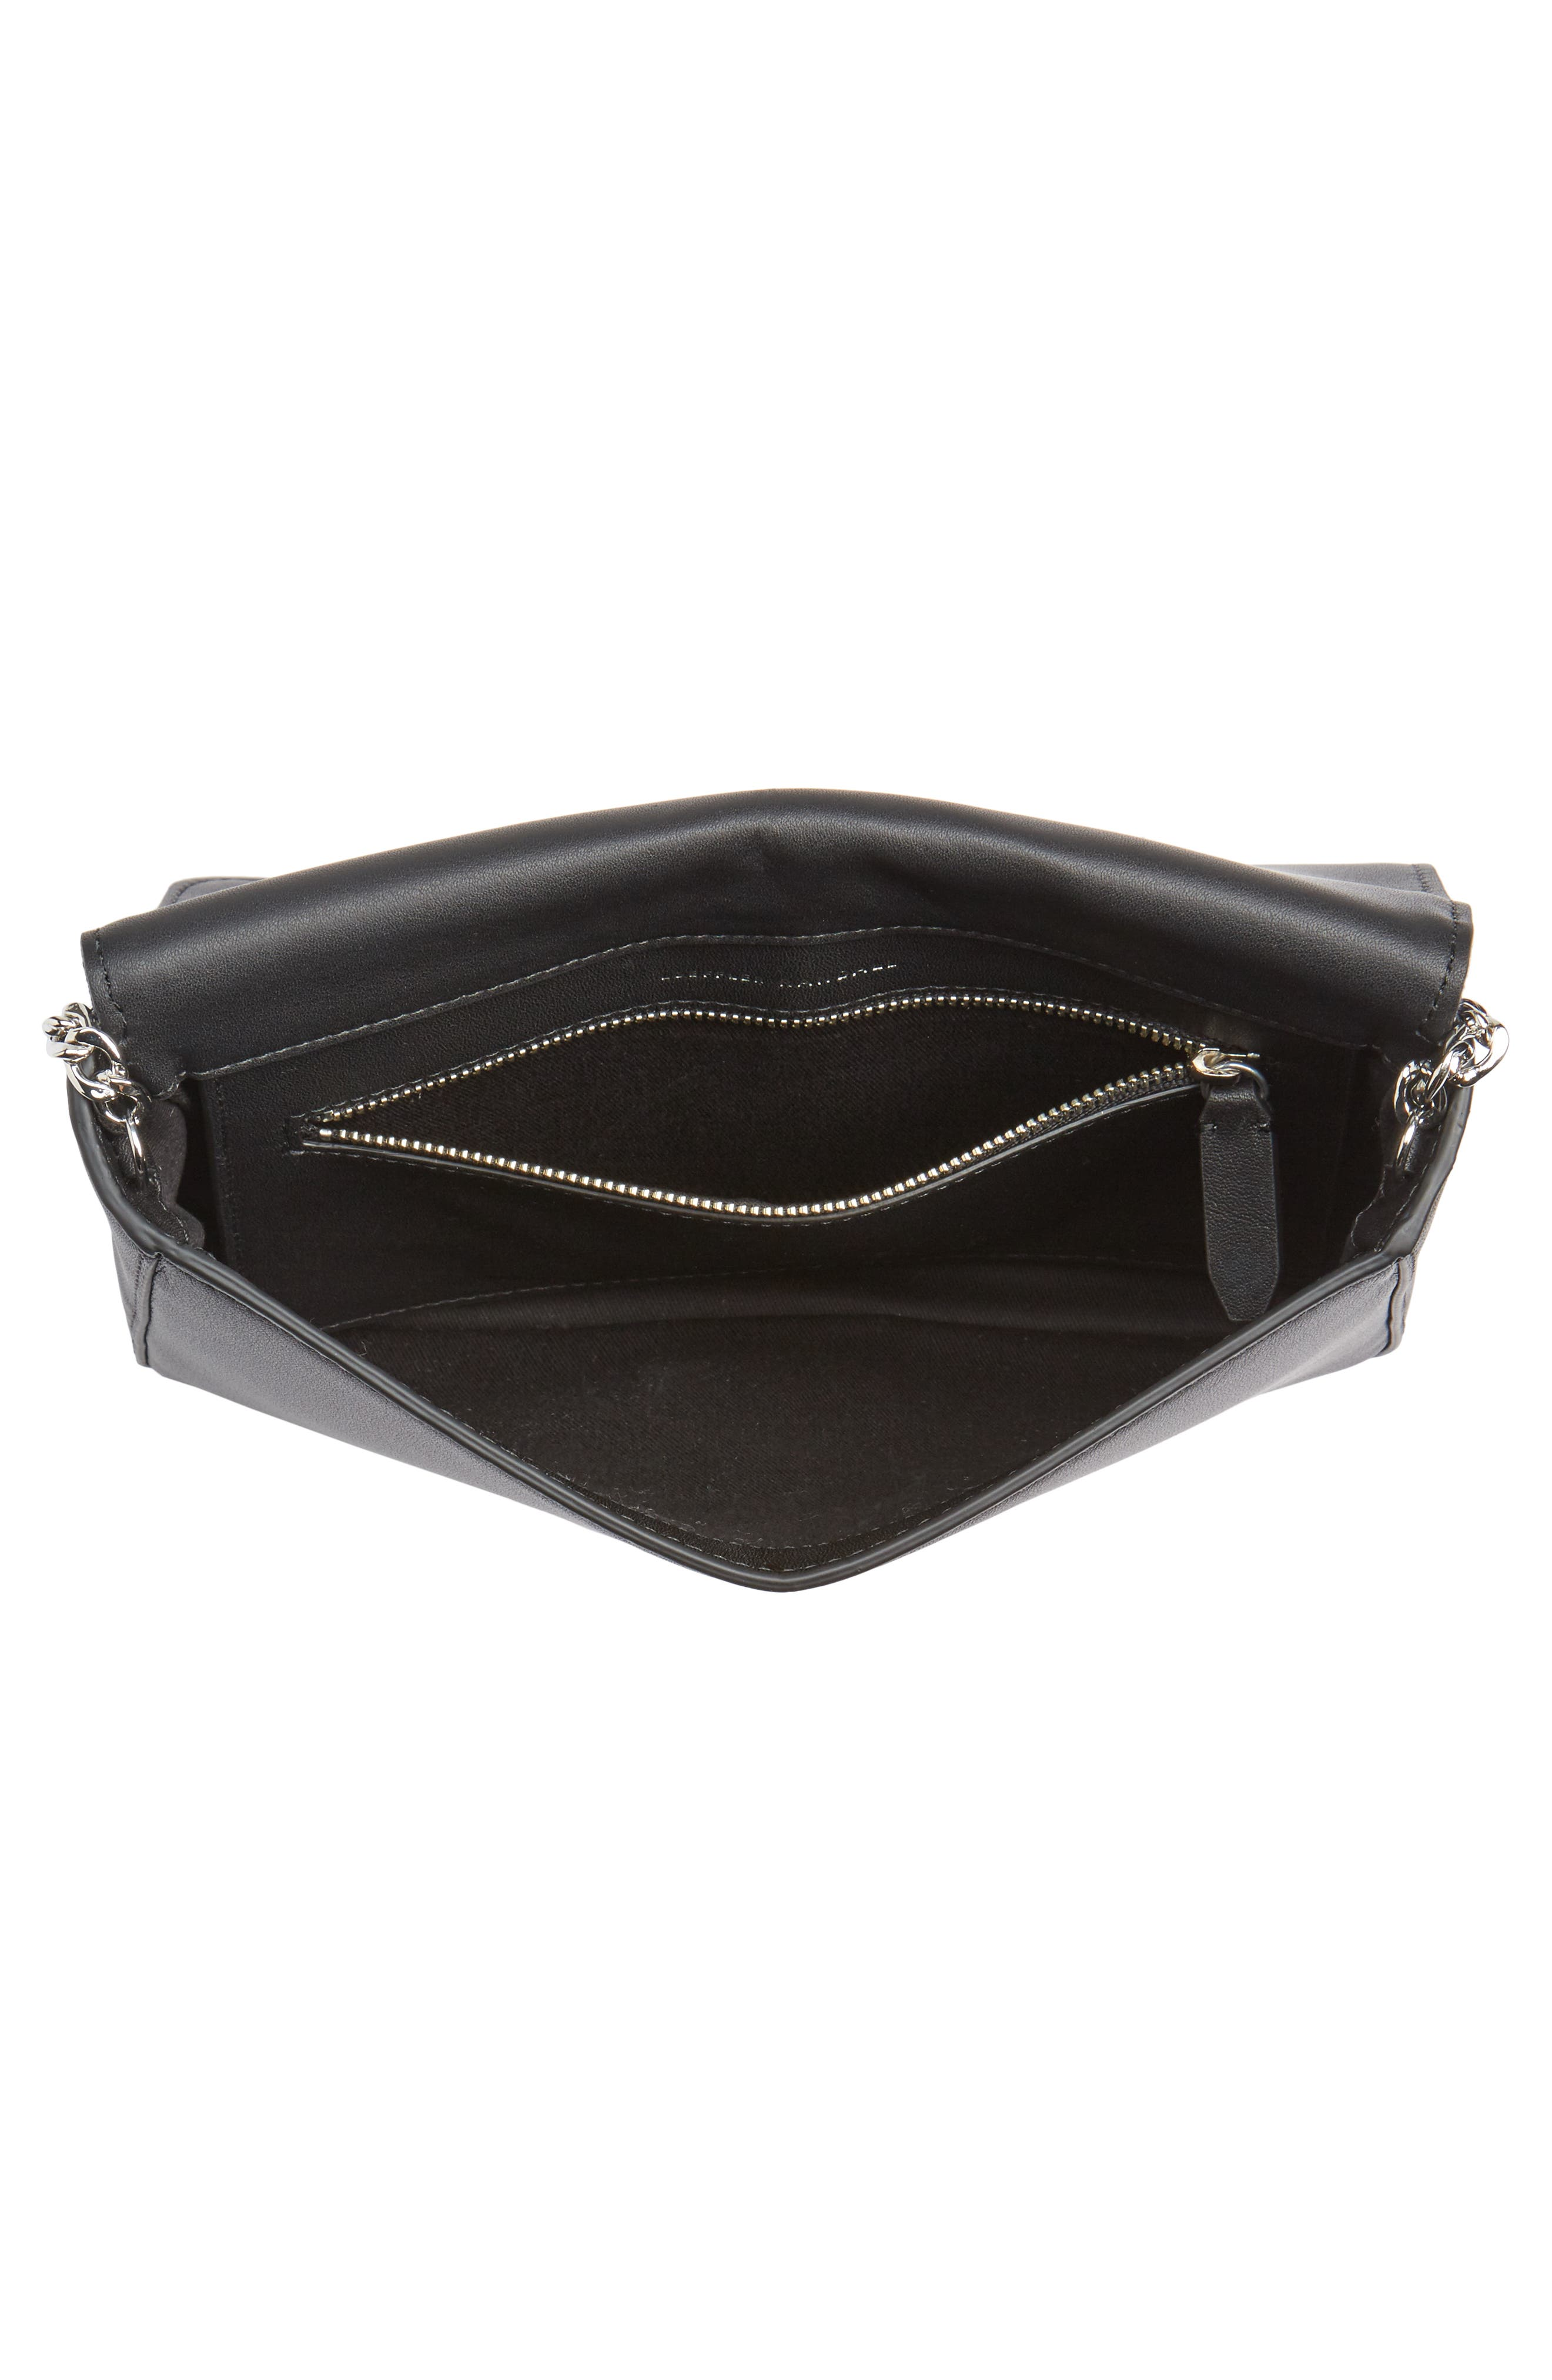 Lock Stripe Clutch/Shoulder Bag,                             Alternate thumbnail 4, color,                             White/ Eclipse